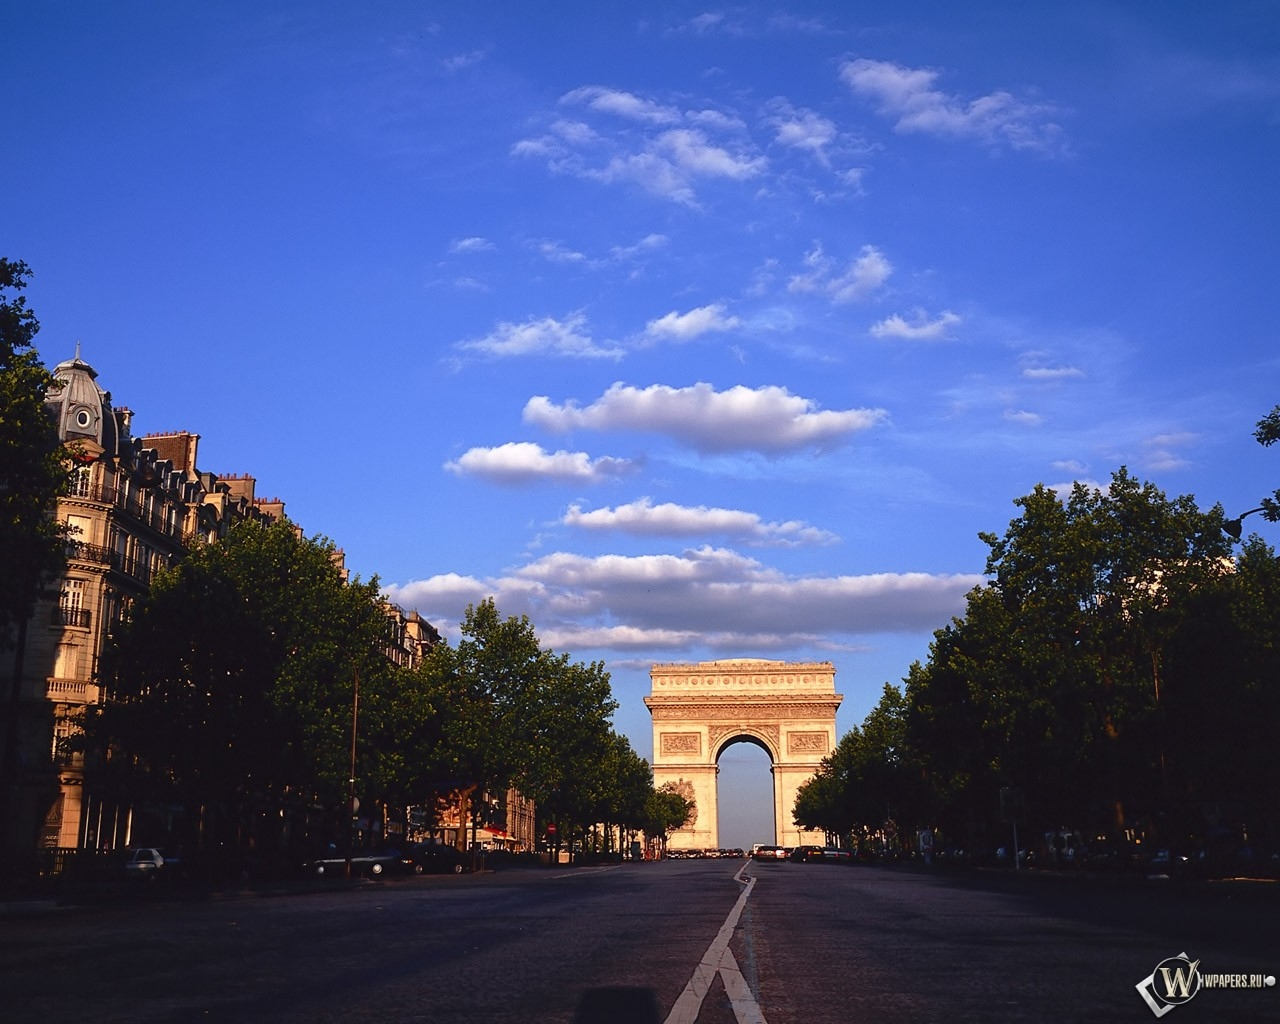 Триумфальная арка - Париж 1280x1024